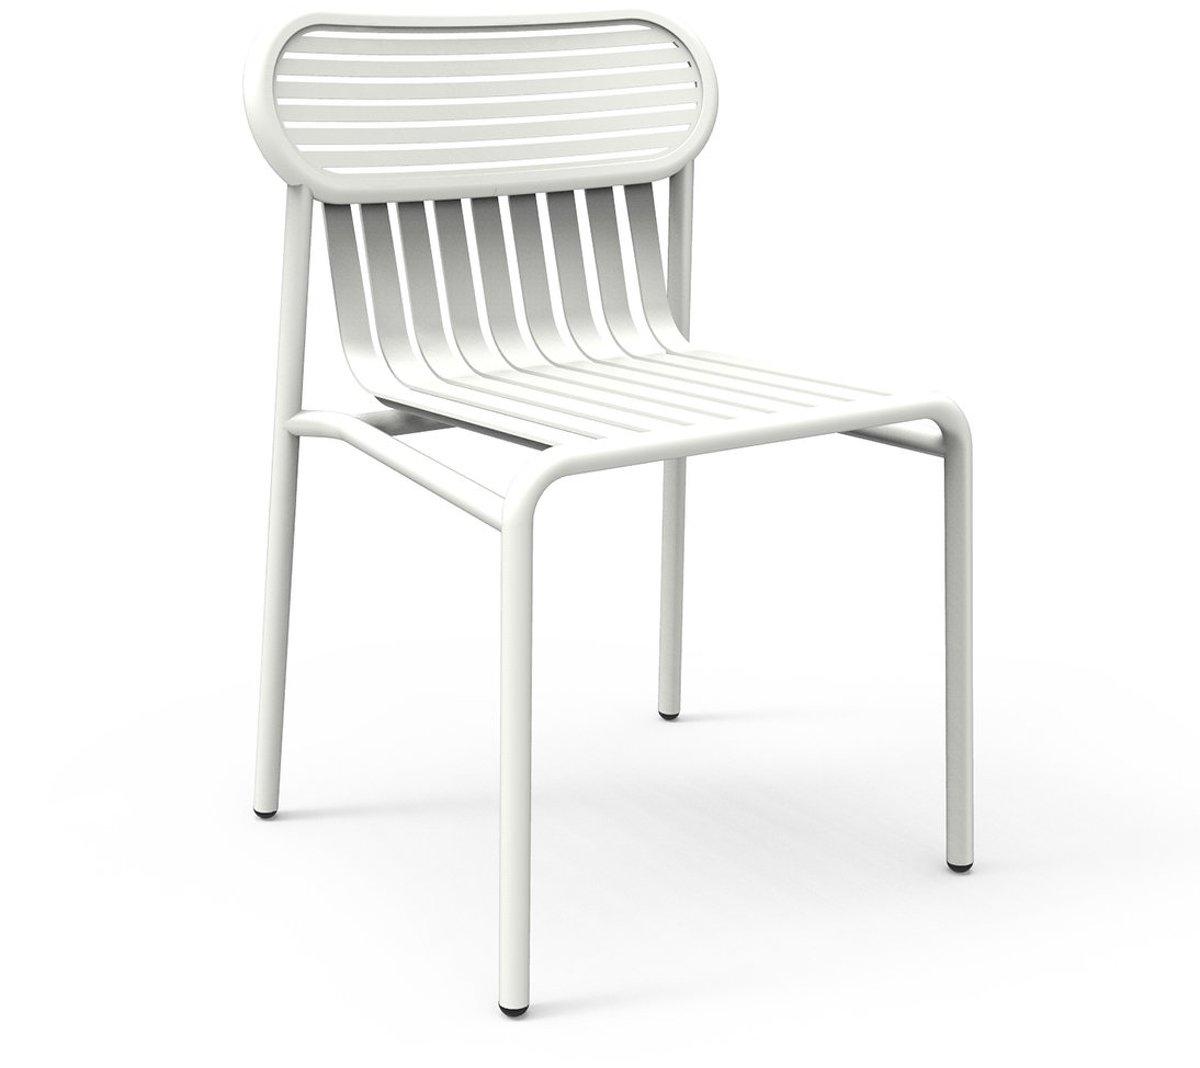 Chaise De Jardin Blanche Week-End - Petite Friture intérieur Chaise De Jardin Blanche